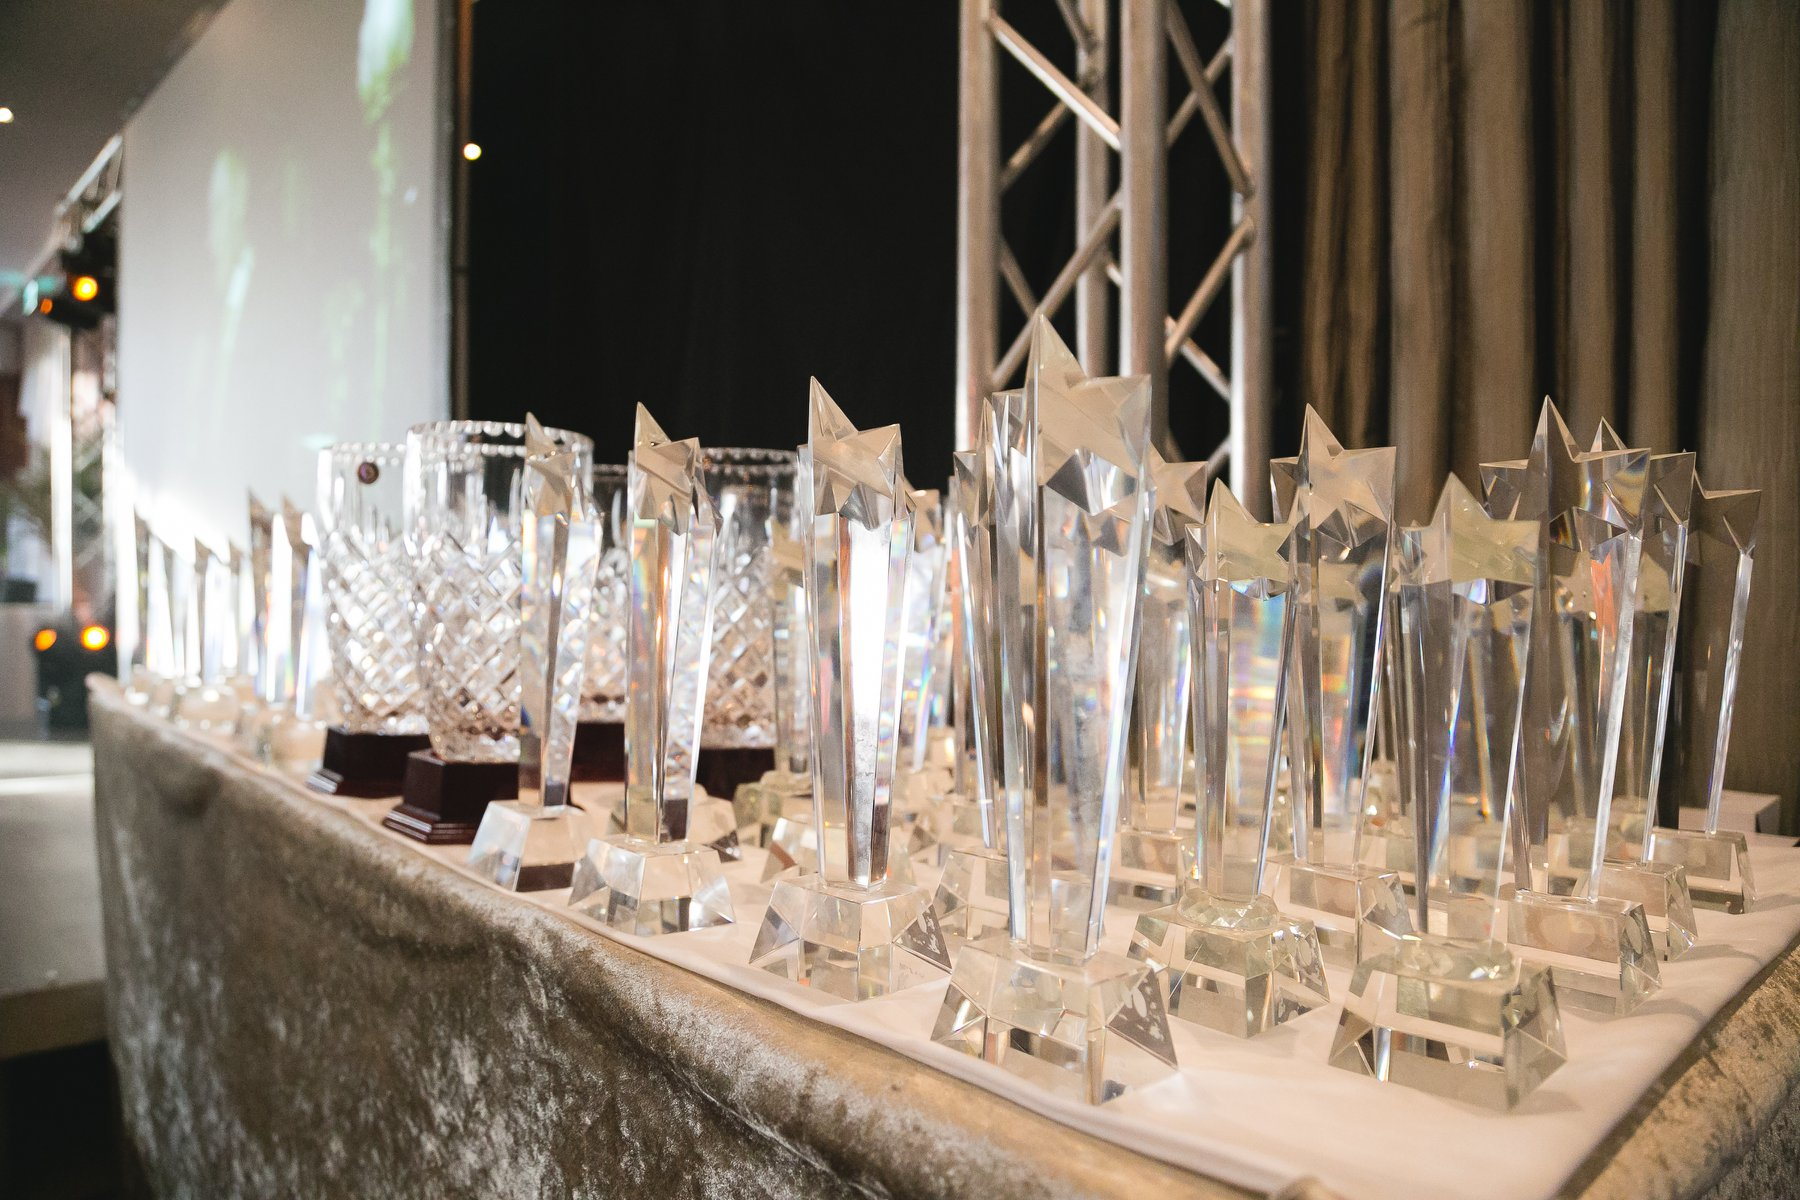 Award Winning Opticians, McCrystals, Dungannon